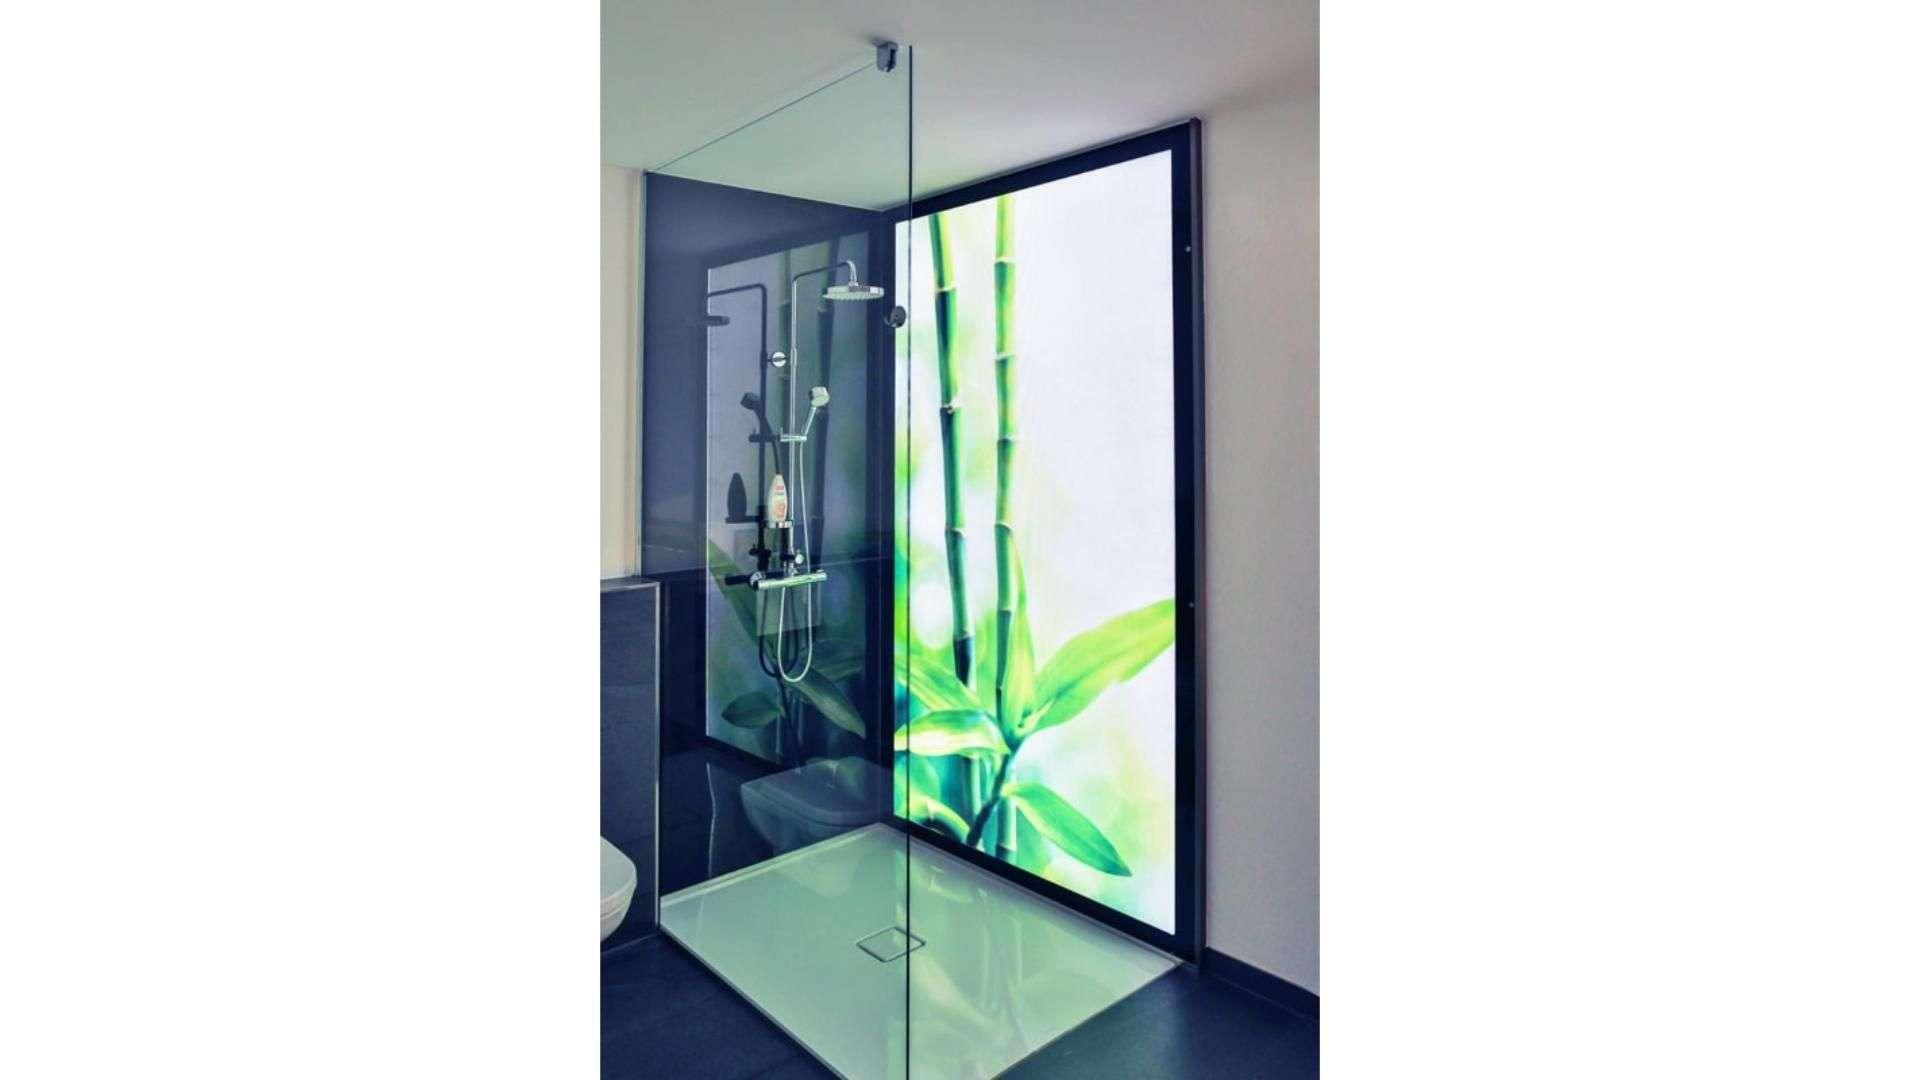 beleuchtetes Cleverglas mit Motivdruck als Duschrückwand